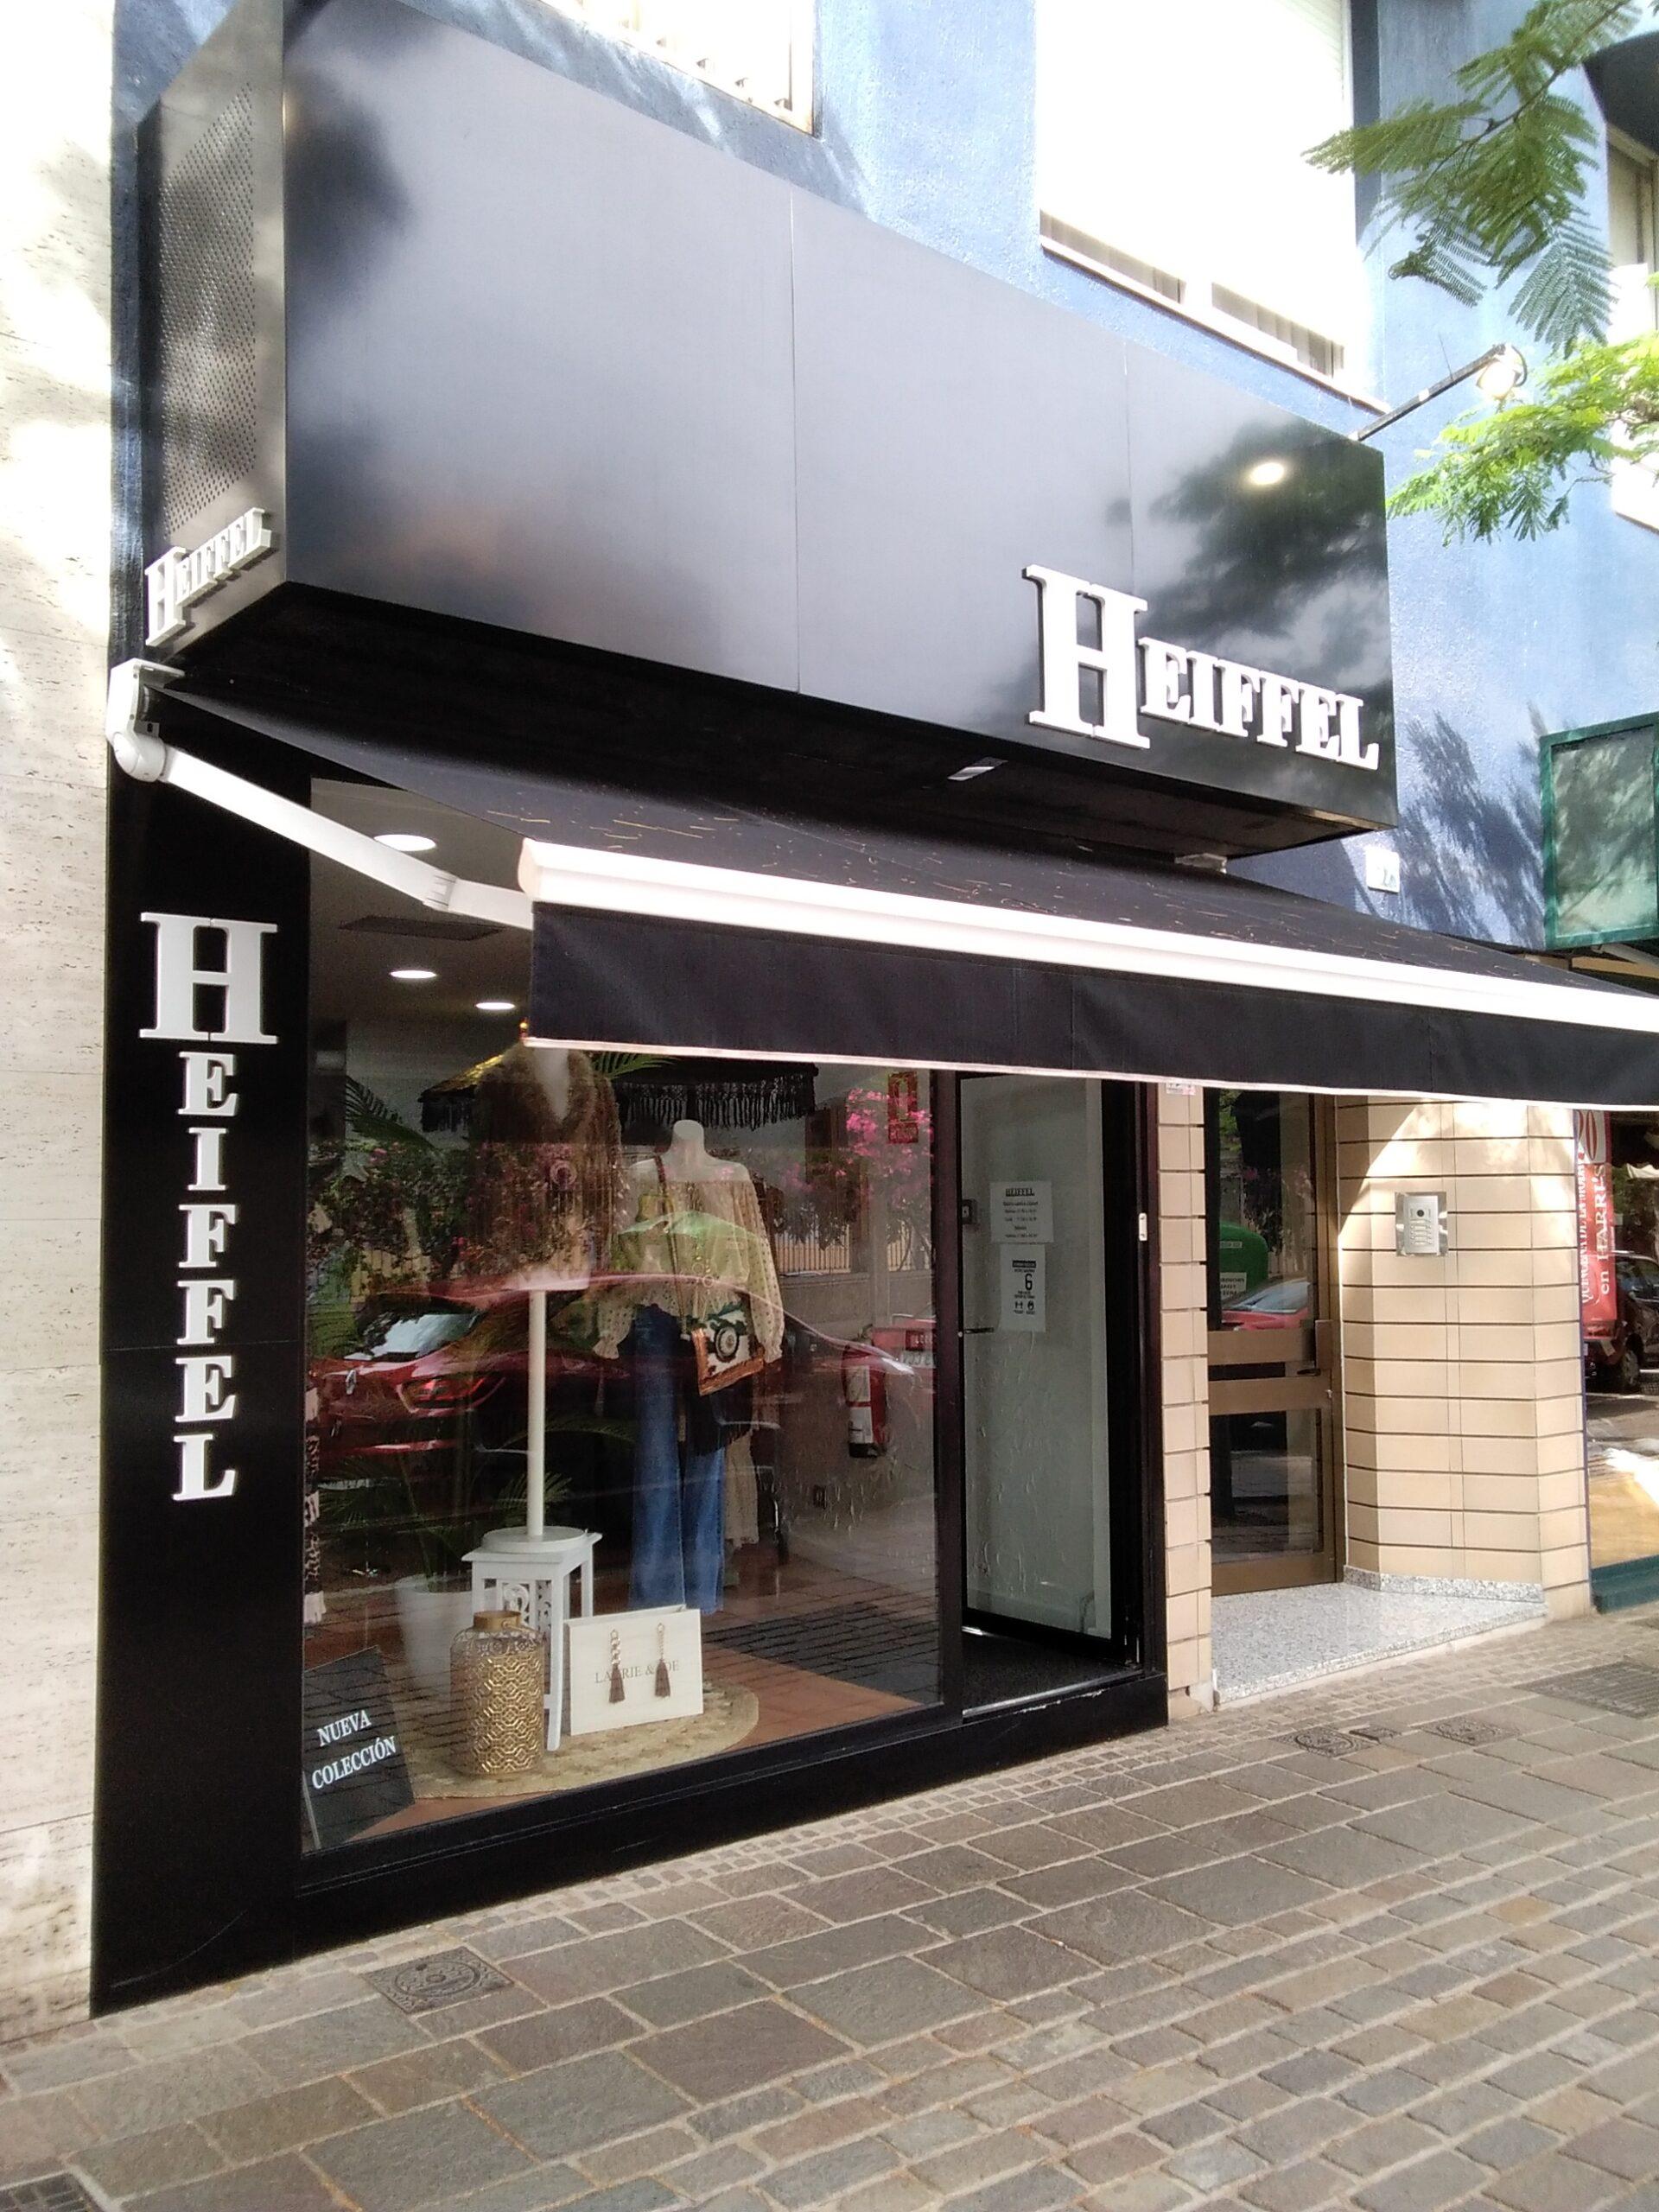 Heiffel